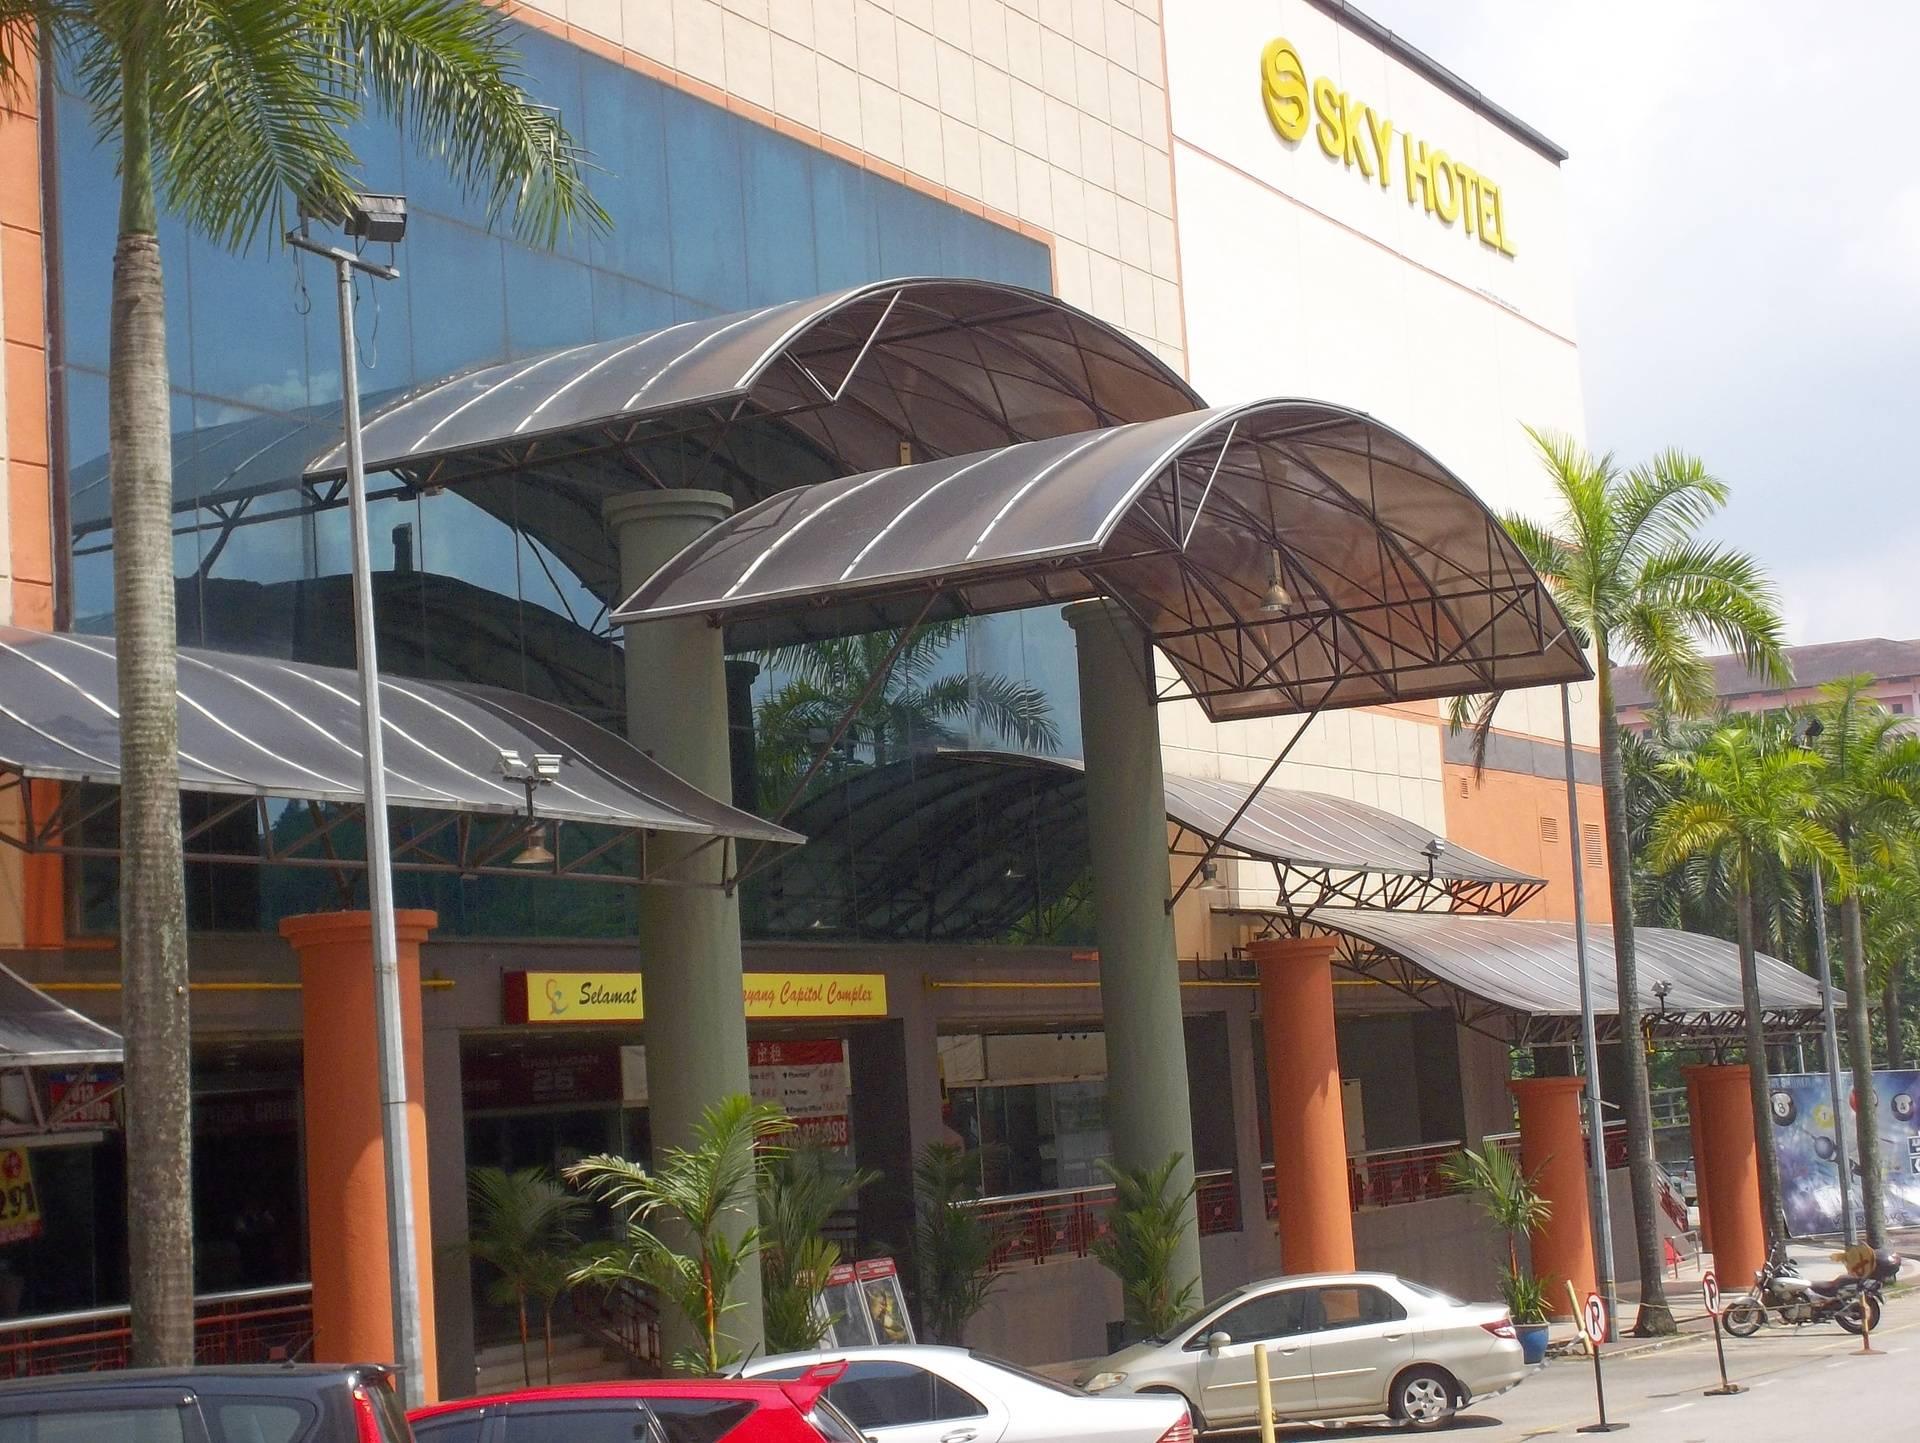 Selayang Capitol Complex, SELAYANG CAPITOL , Lebuhraya Selayang - Kepong , , 68100 Batu Caves, Selangor, Batu Caves, Selangor, 68100, Malaysia